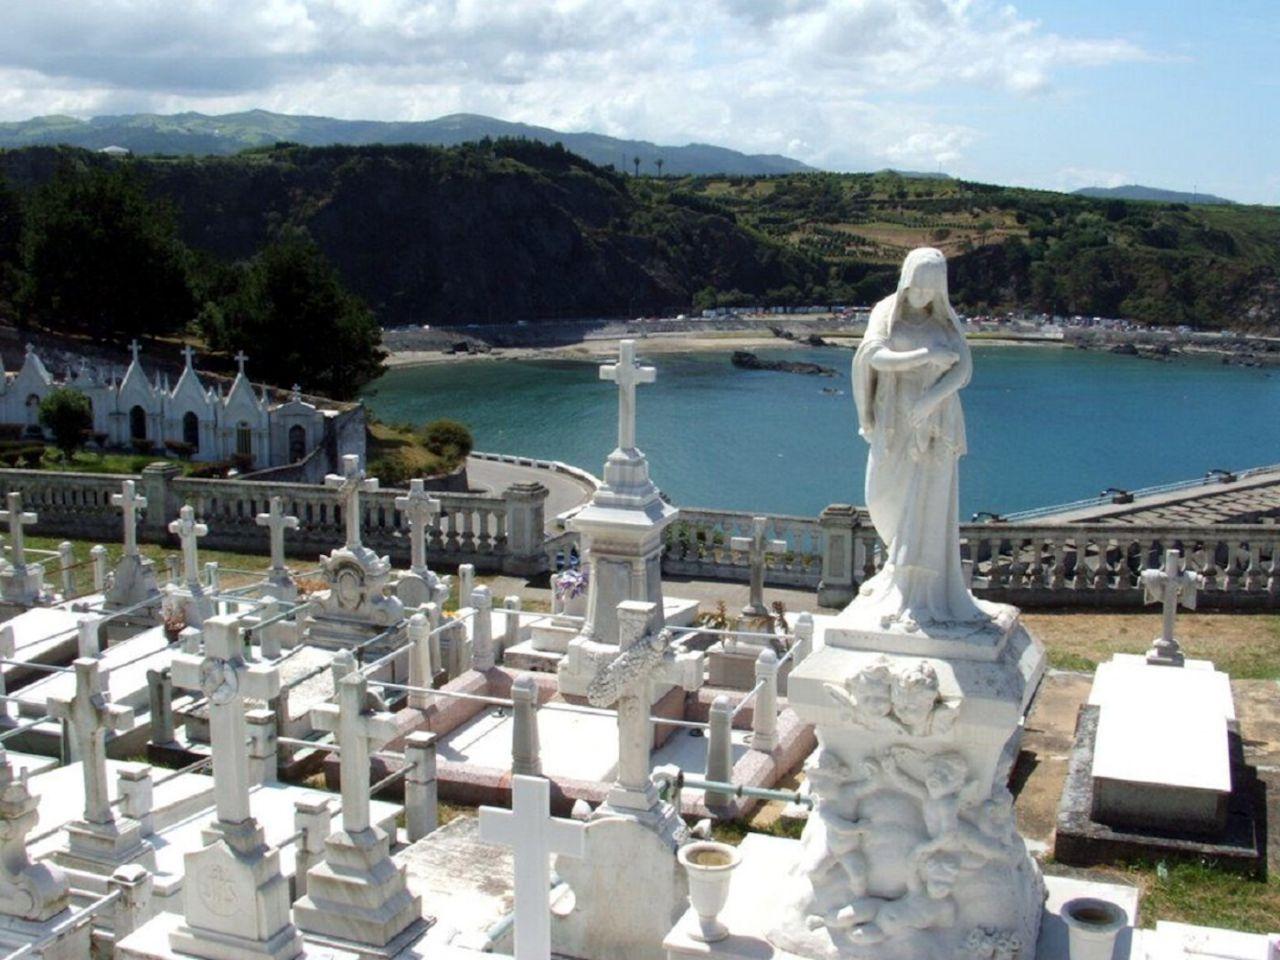 Cementerio de Luarca en Asturias